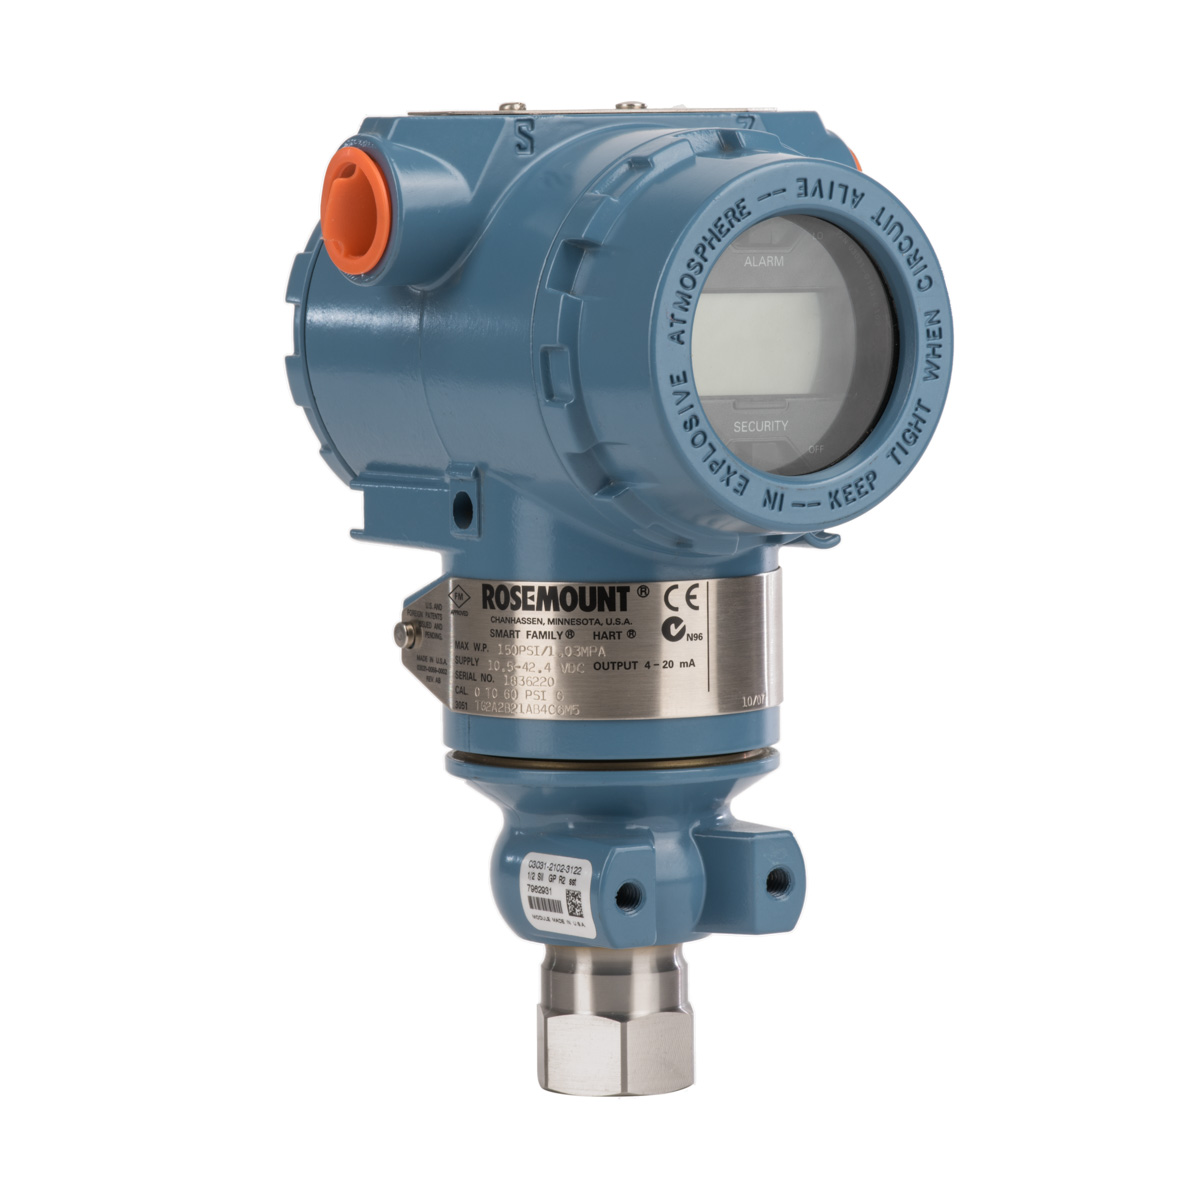 Rosemount 3051TA Absolute Pressure Transmitter